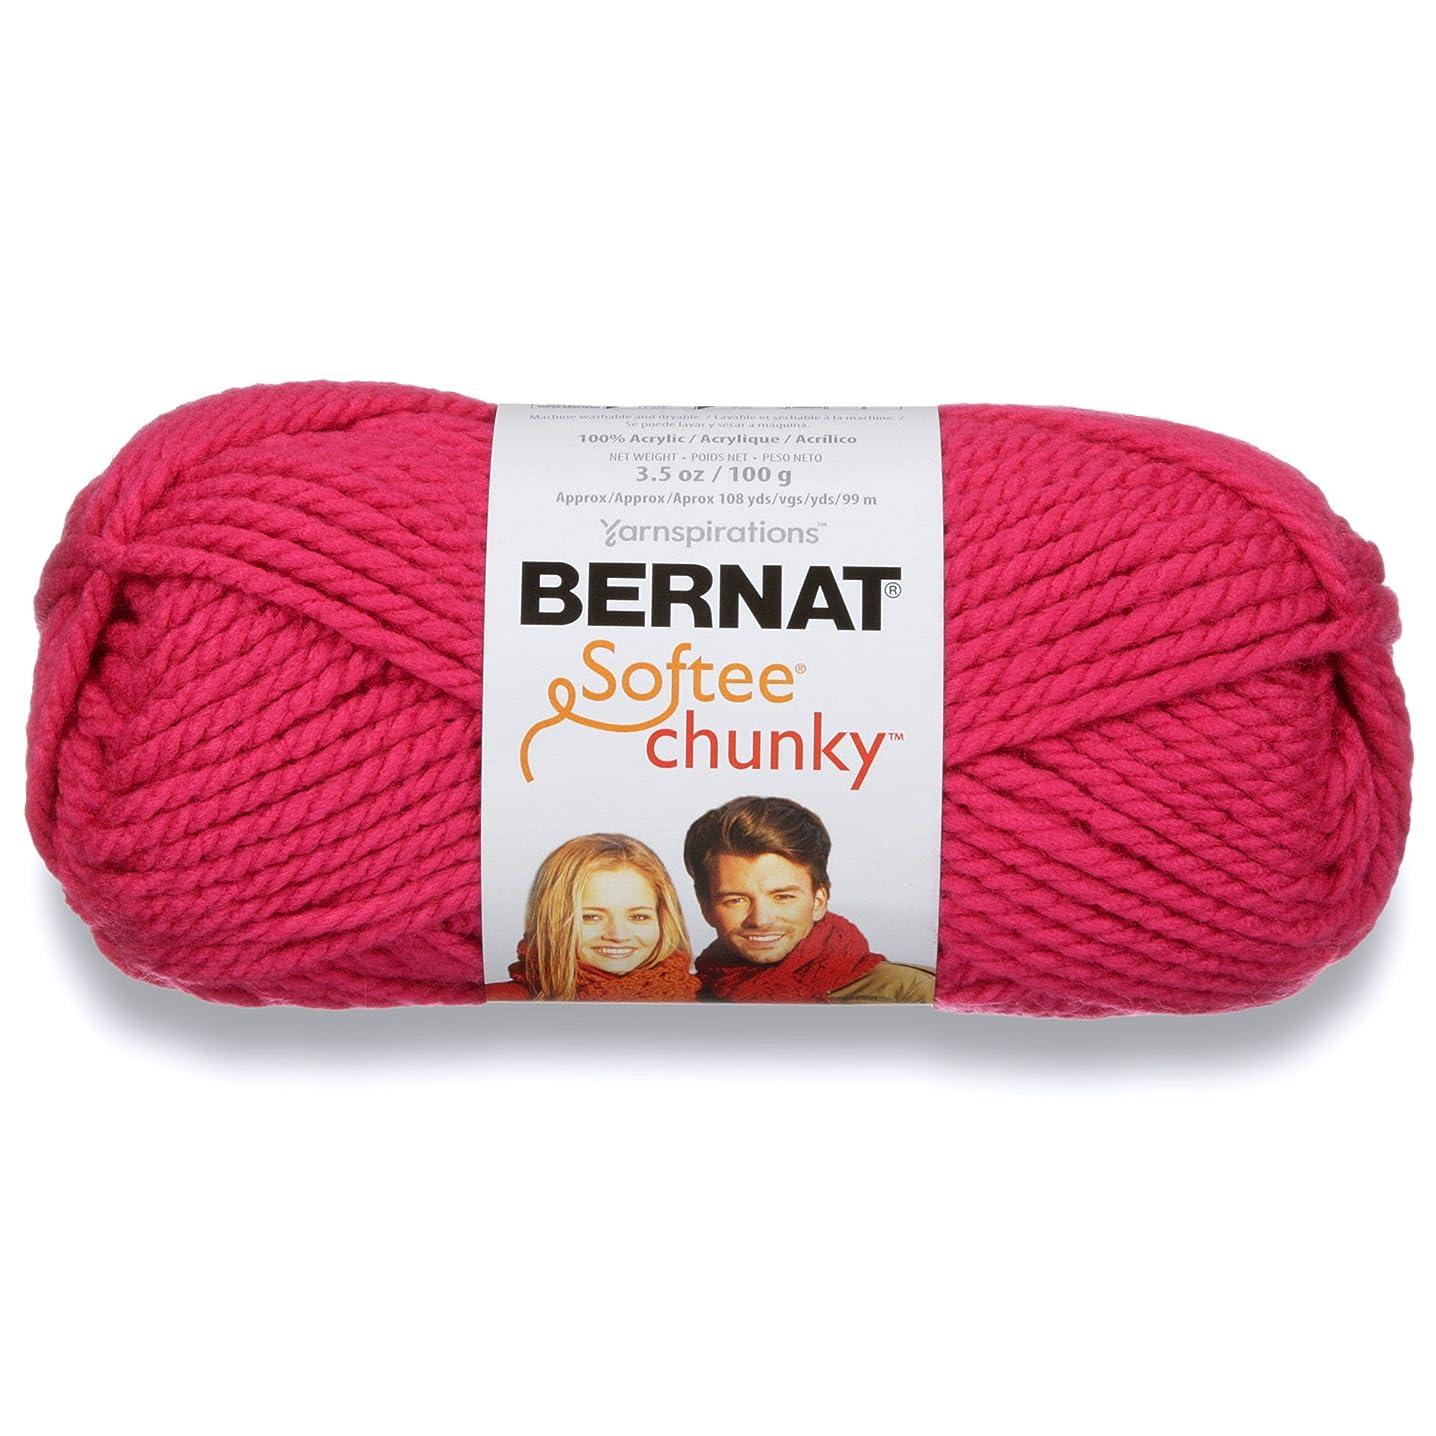 Bernat Softee Chunky Yarn, 3.5 Oz, Gauge 6 Super Bulky, Hot Pink